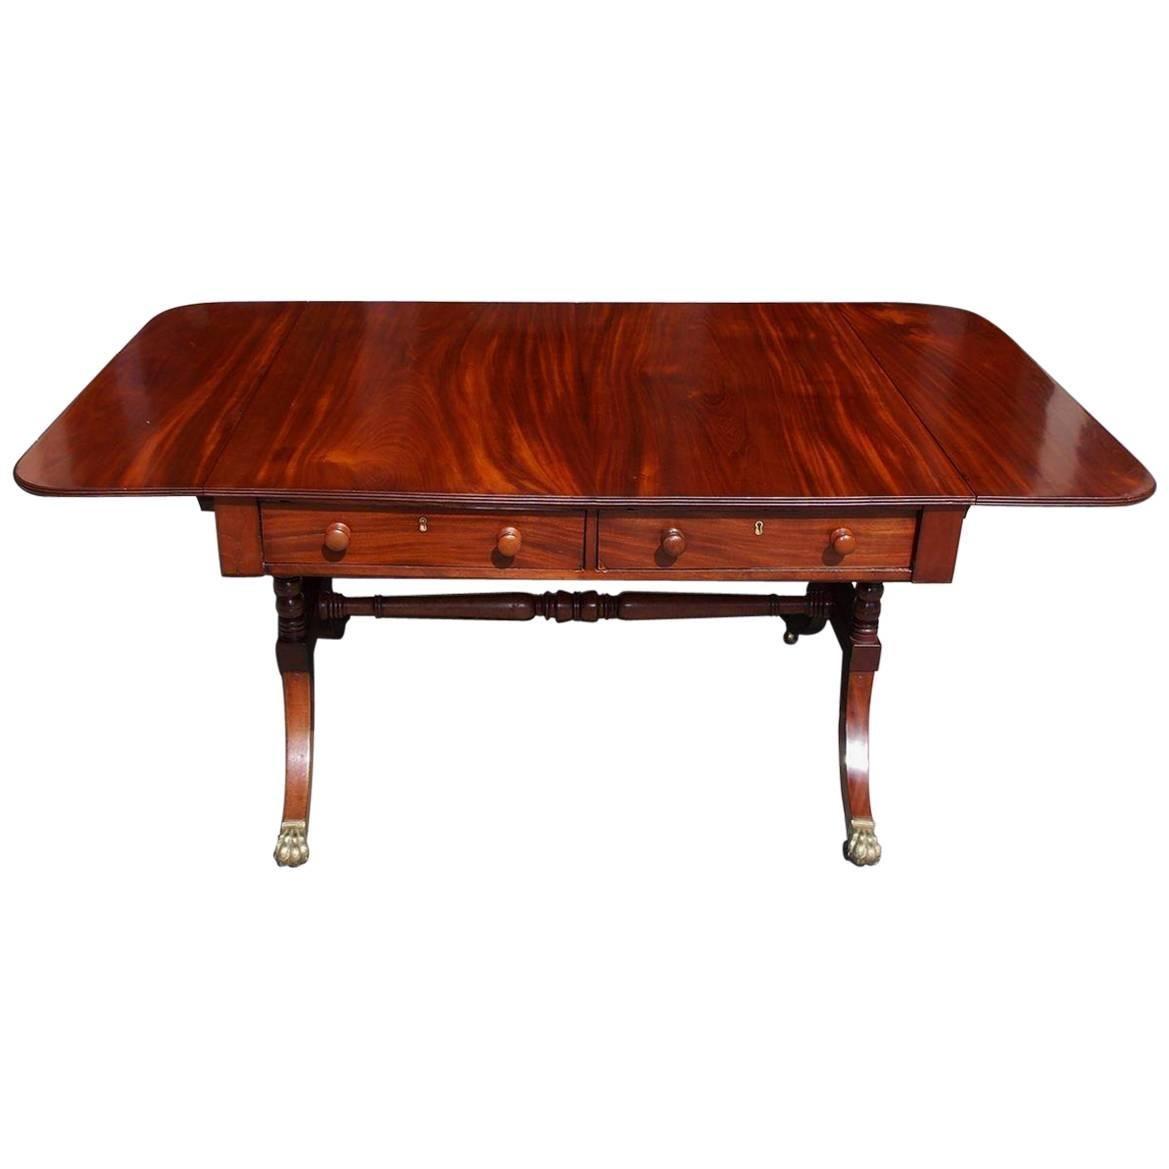 English Mahogany Drop-Leaf Sofa Table on Lion Paw Brass Casters, Circa 1790